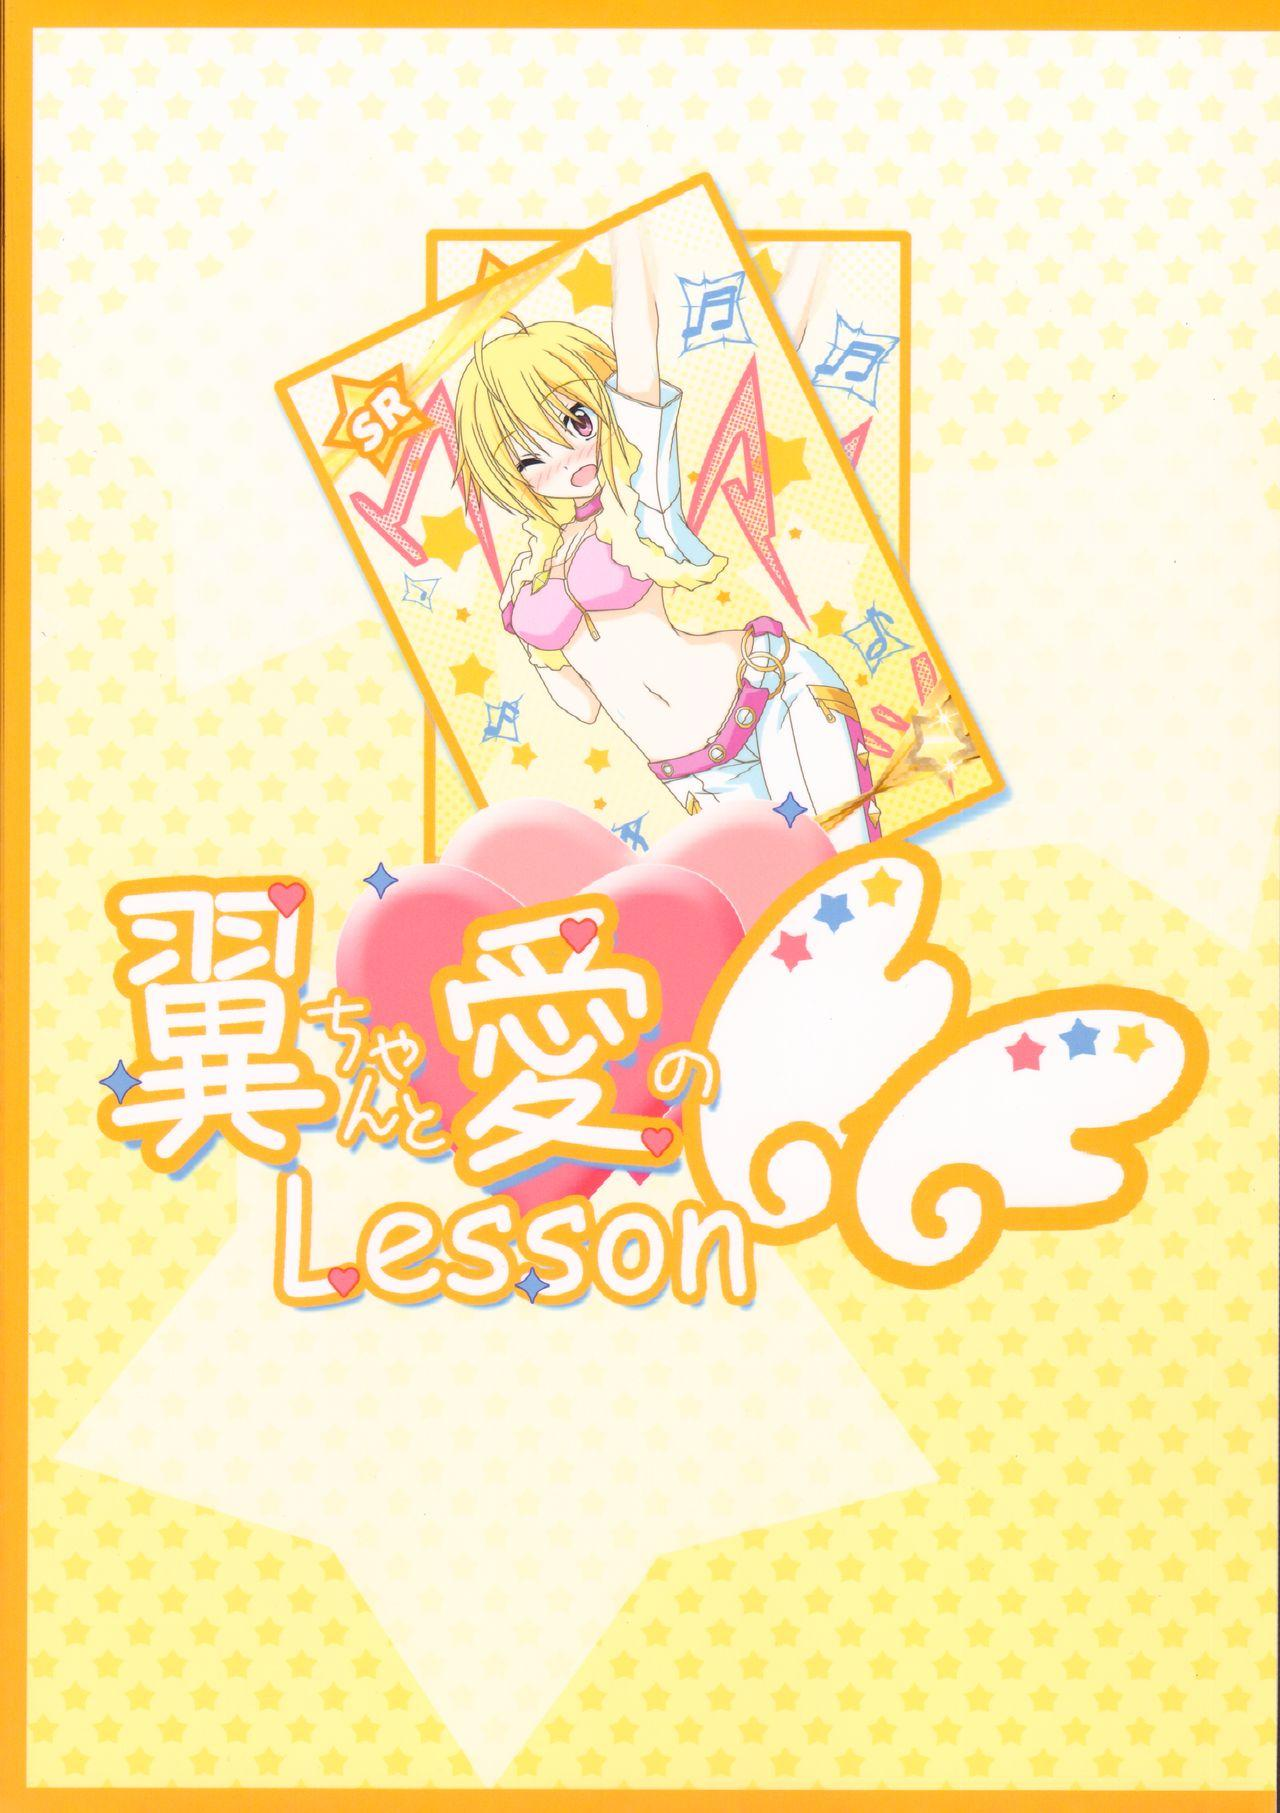 Tsubasa-chan to Ai no Lesson 29